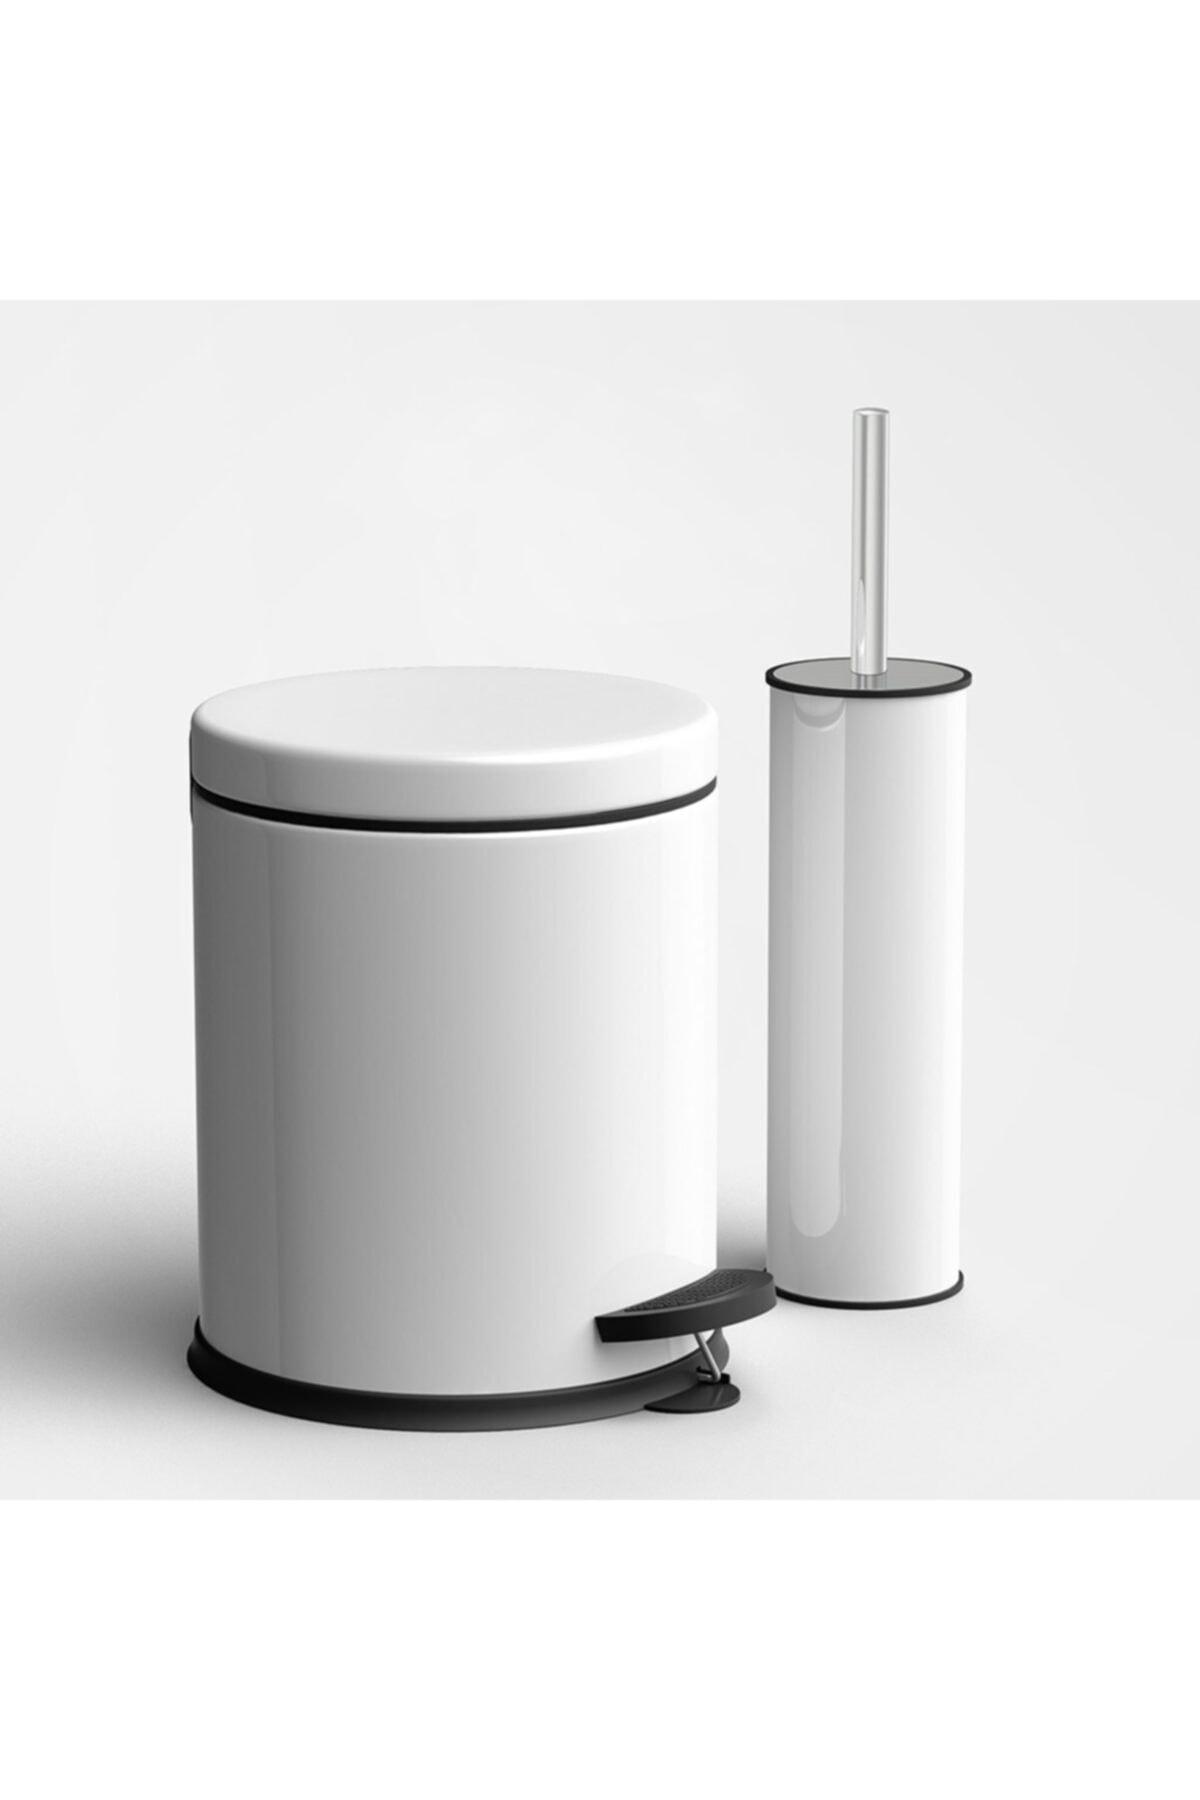 Beyaz 3 Litre 2'li Banyo Seti Pedallı Çöp Kovası Wc Klozet Tuvalet Fırça Seti Banyo Çöp Kovası